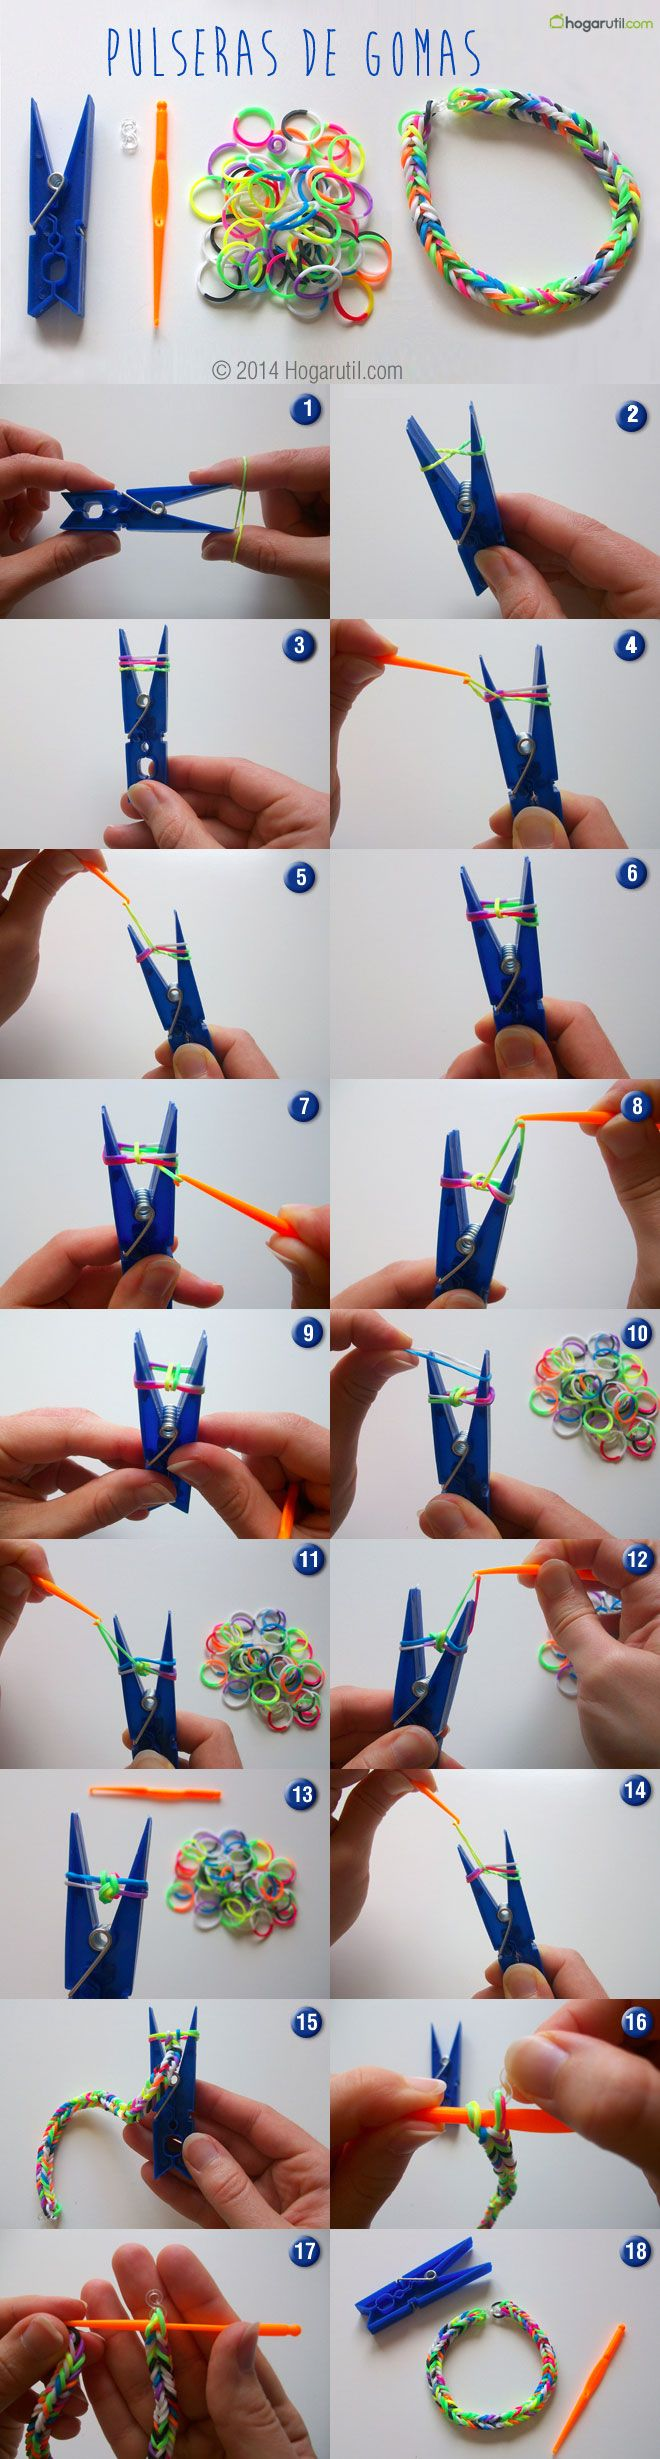 pasos-hacer-pulseras-gomas-XxXx80